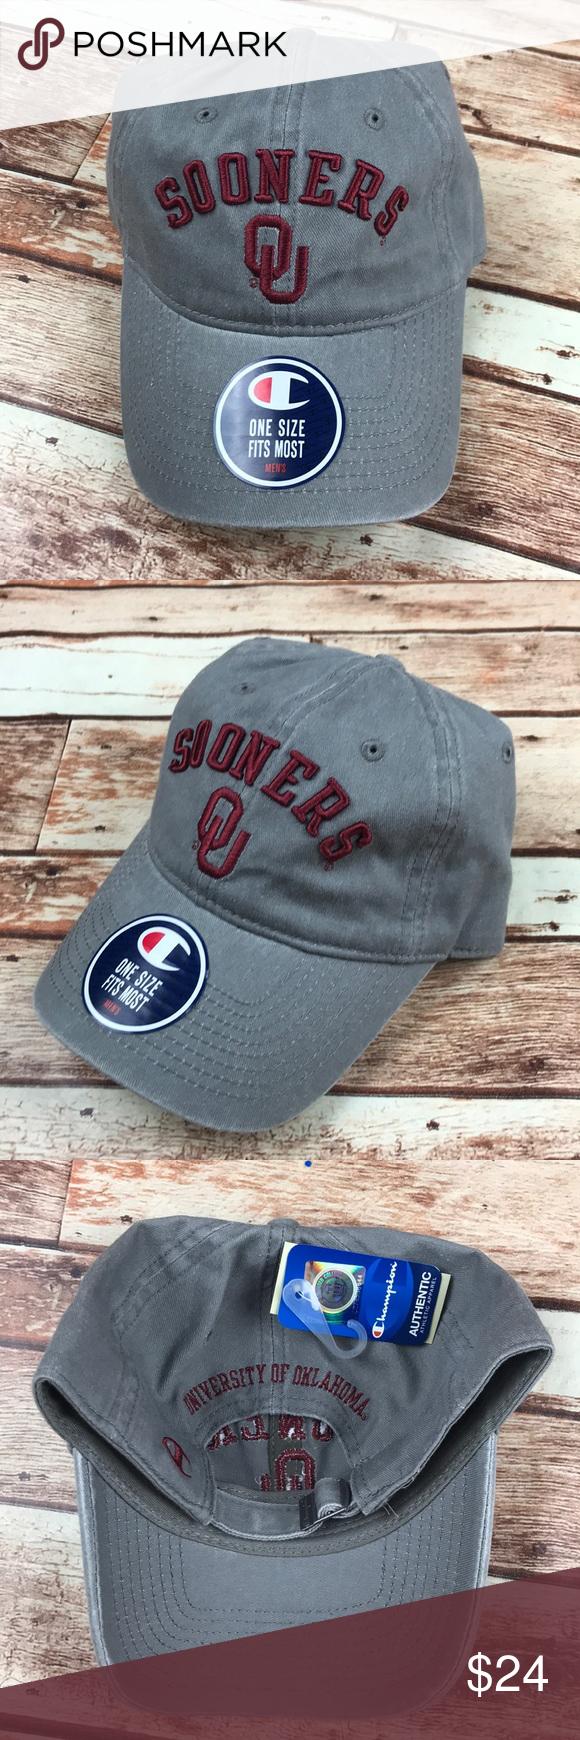 OU Oklahoma Sooners Gray Dad Strap Baseball Hat University of Oklahoma  Sooners gray adjustable fit baseball cap hat. Brand  Champion Size  One  size fits ... 9e81e9e65e27